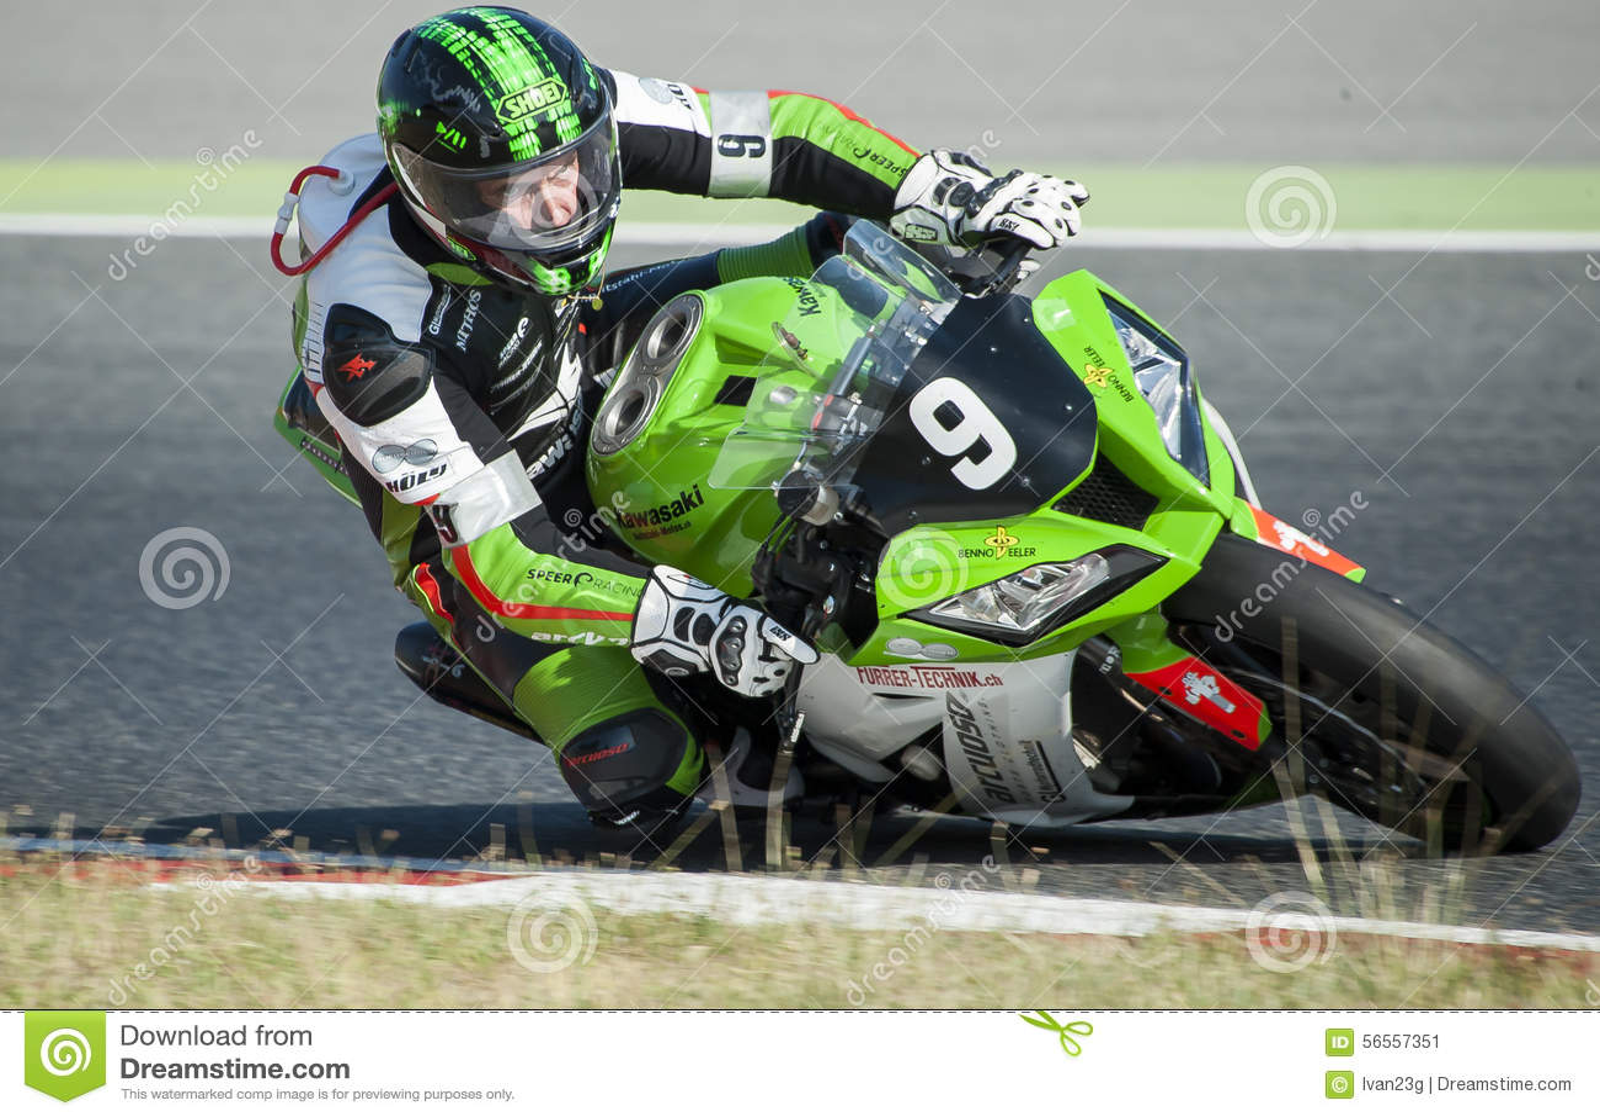 Download 24 ΑΝΤΟΧΗ ΩΡΩΝ MOTORCYCLING ΤΗΣ ΒΑΡΚΕΛΩΝΗΣ Εκδοτική Εικόνες - εικόνα από μηχανή, οδήγηση: 56557351